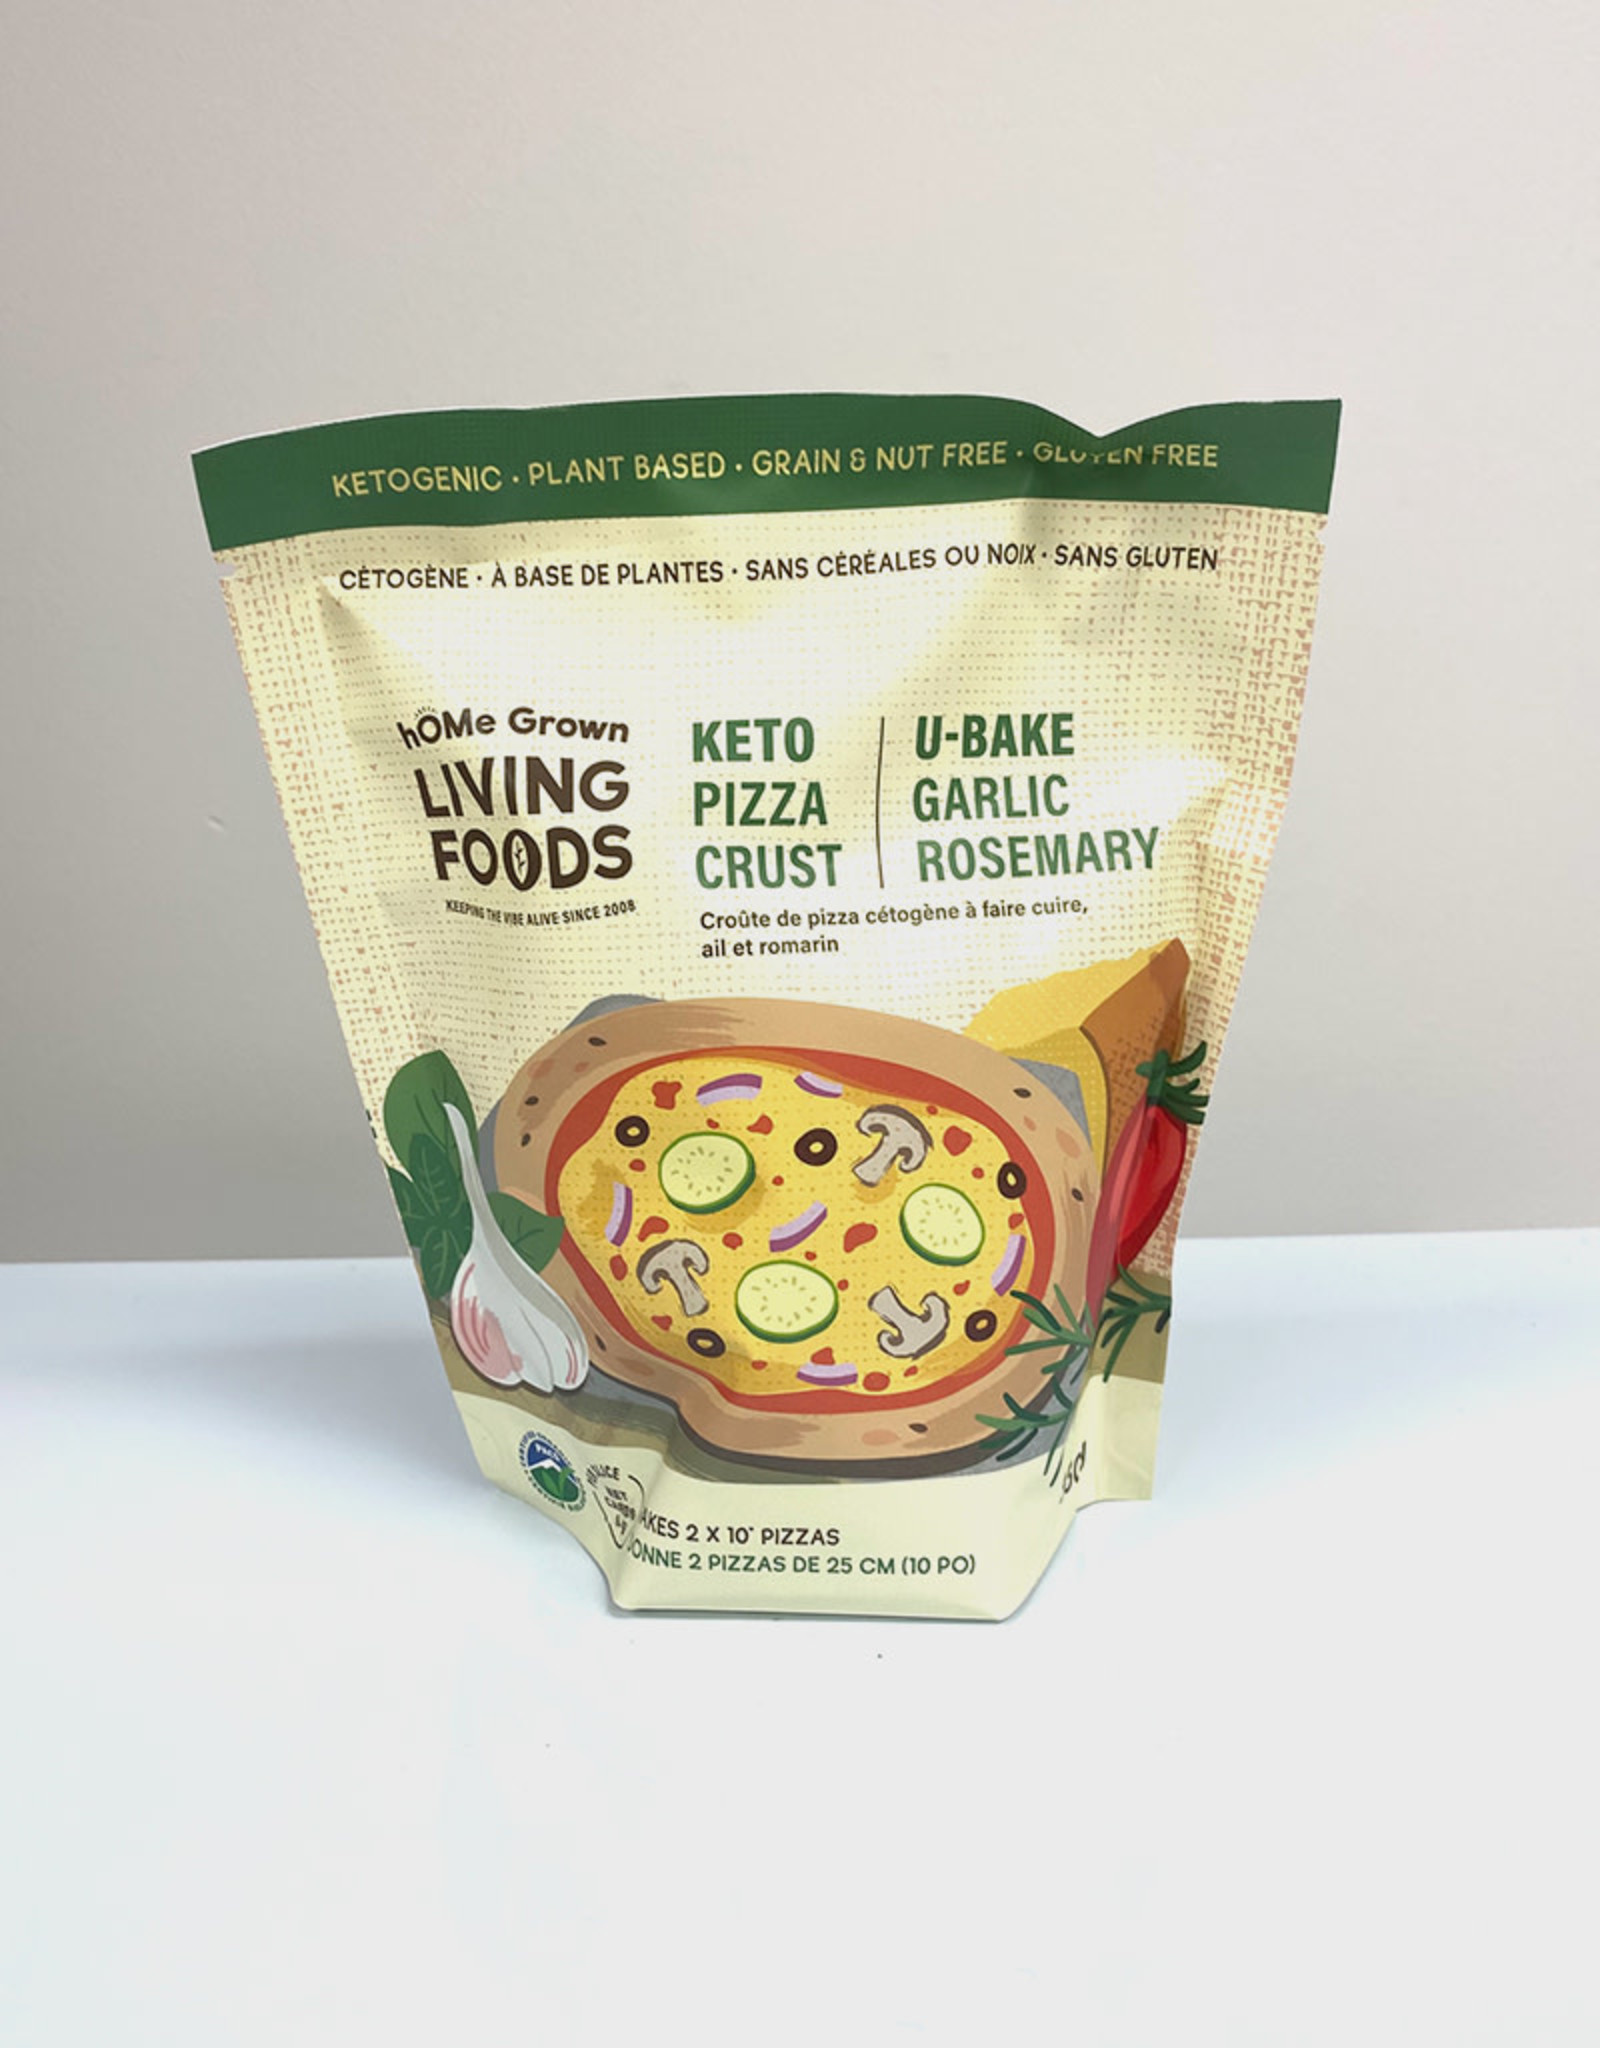 Home Grown Foods Home Grown Foods - Keto Garlic Pizza Crust (330g)